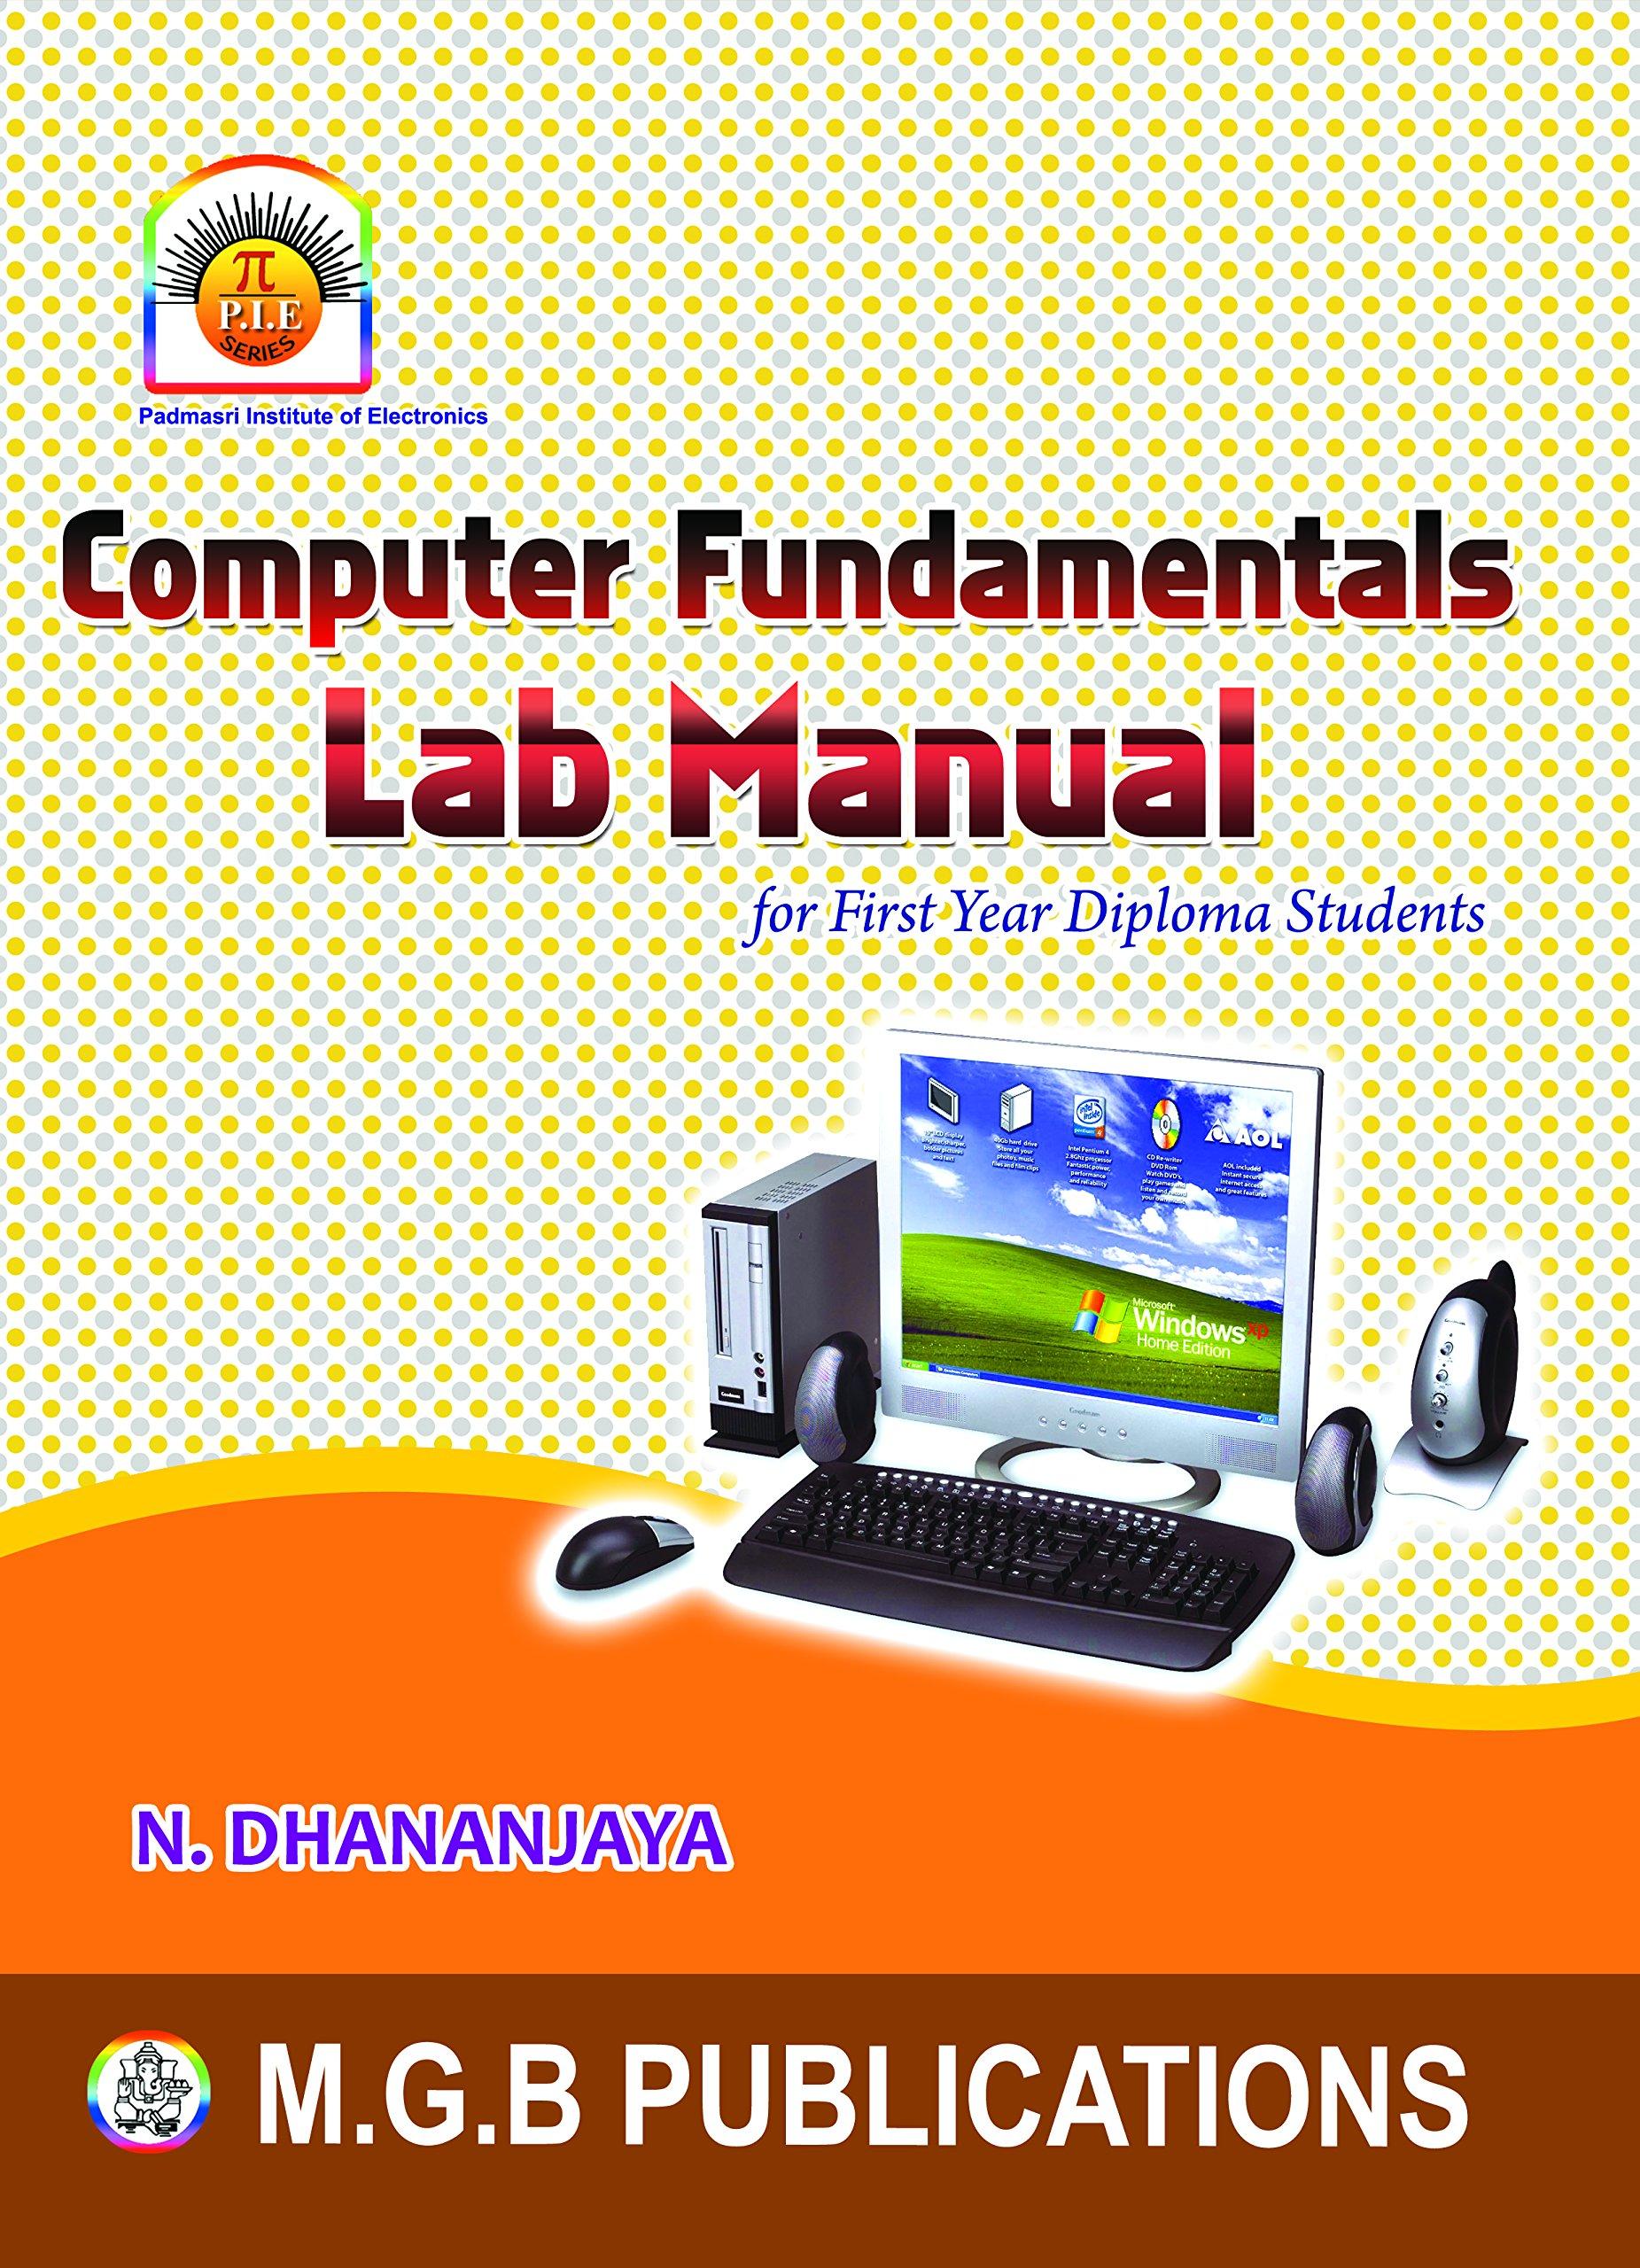 Ds lab manual by s. K. Rath.